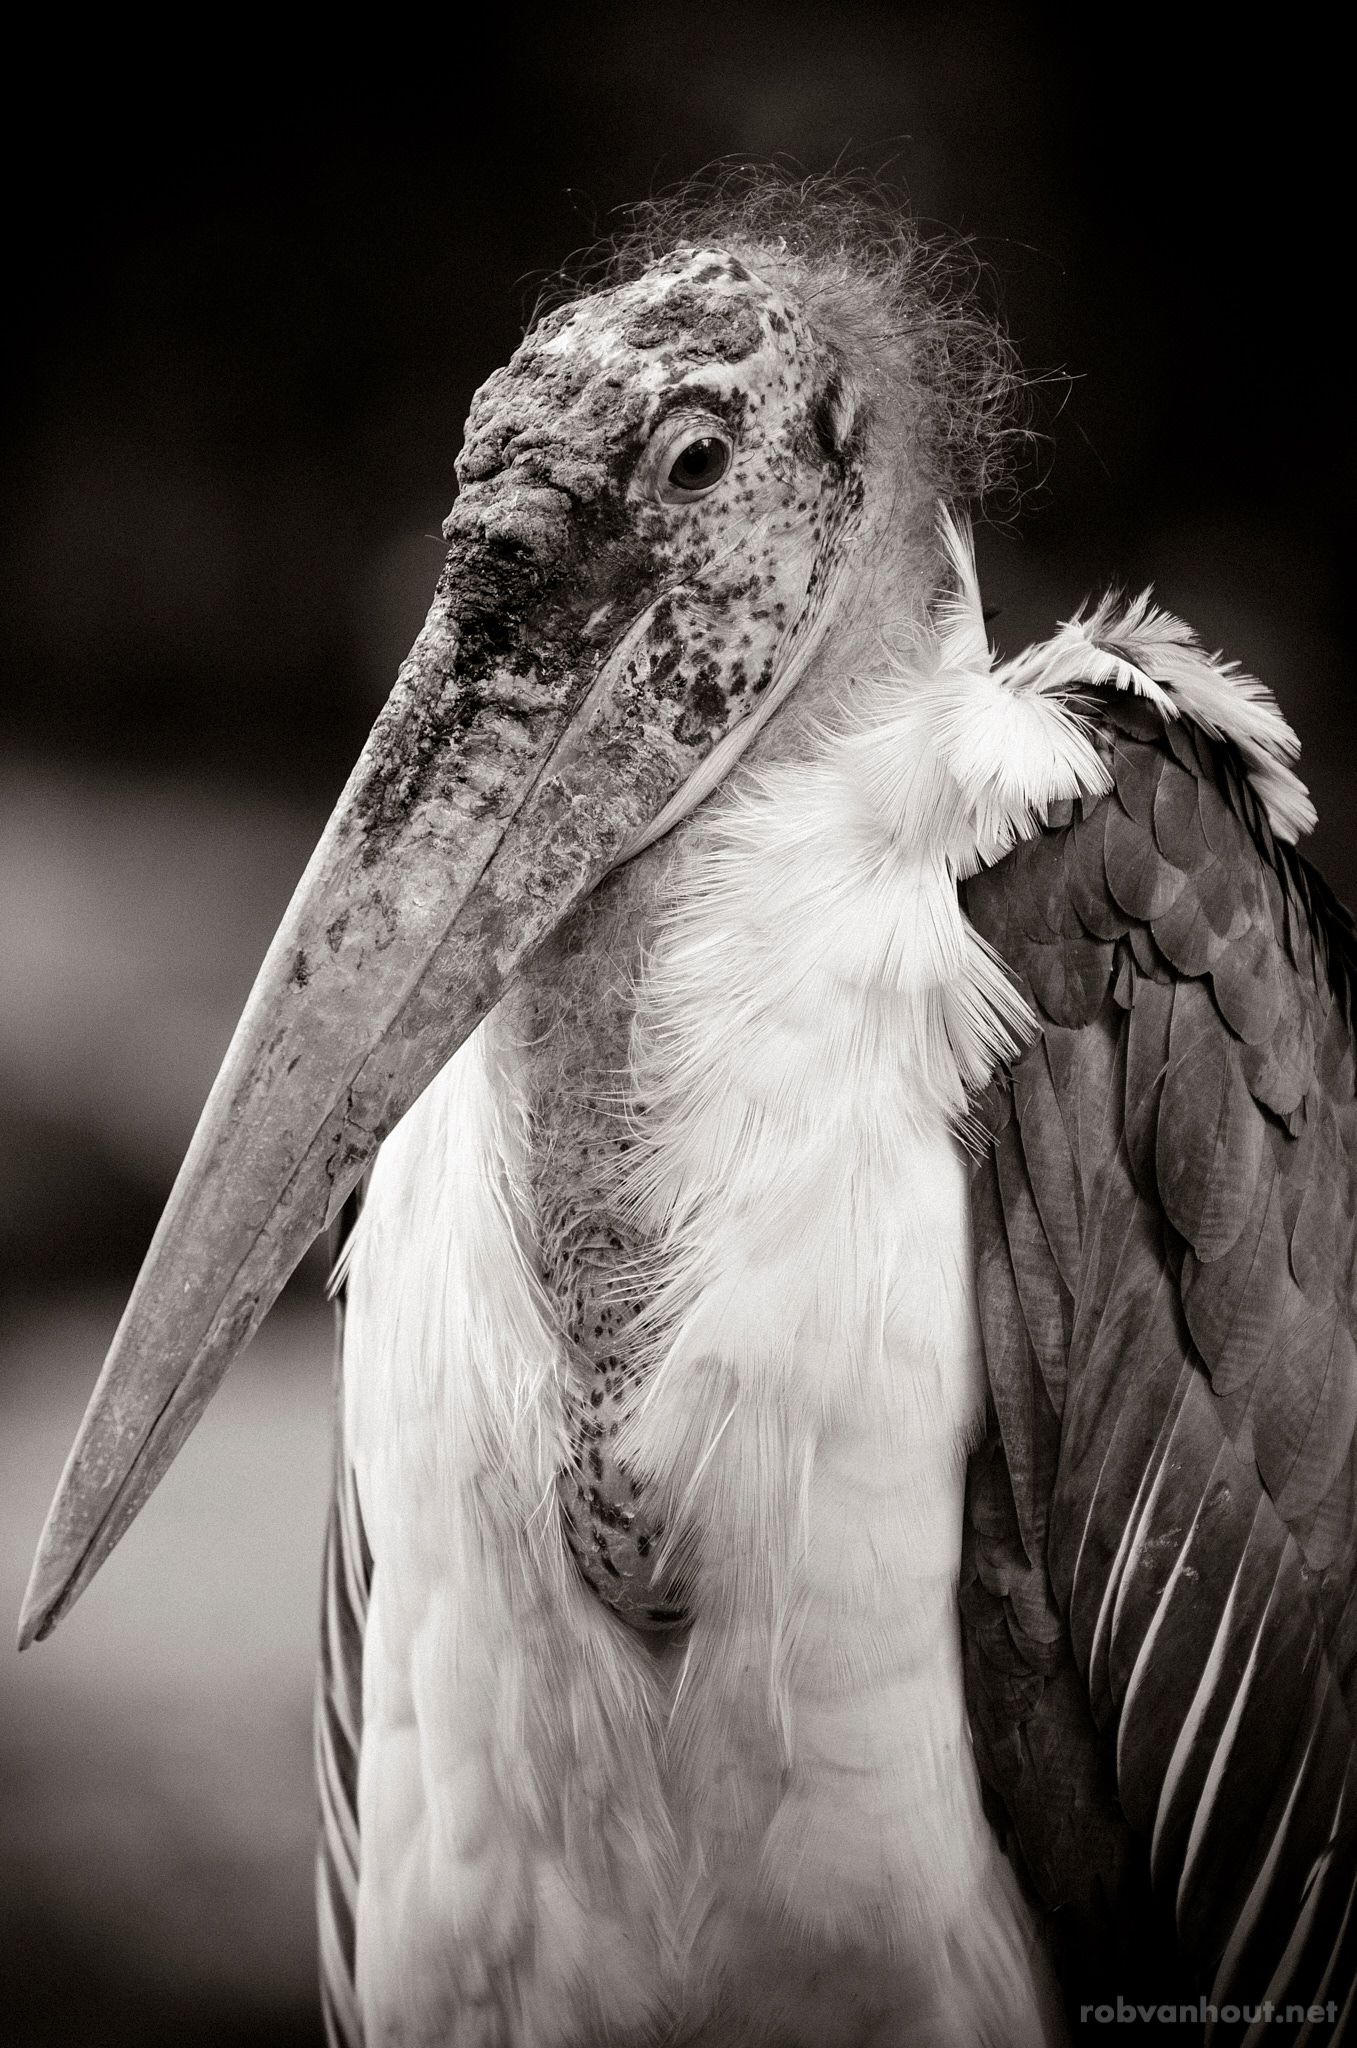 Marabou Stork — Emmen Zoo